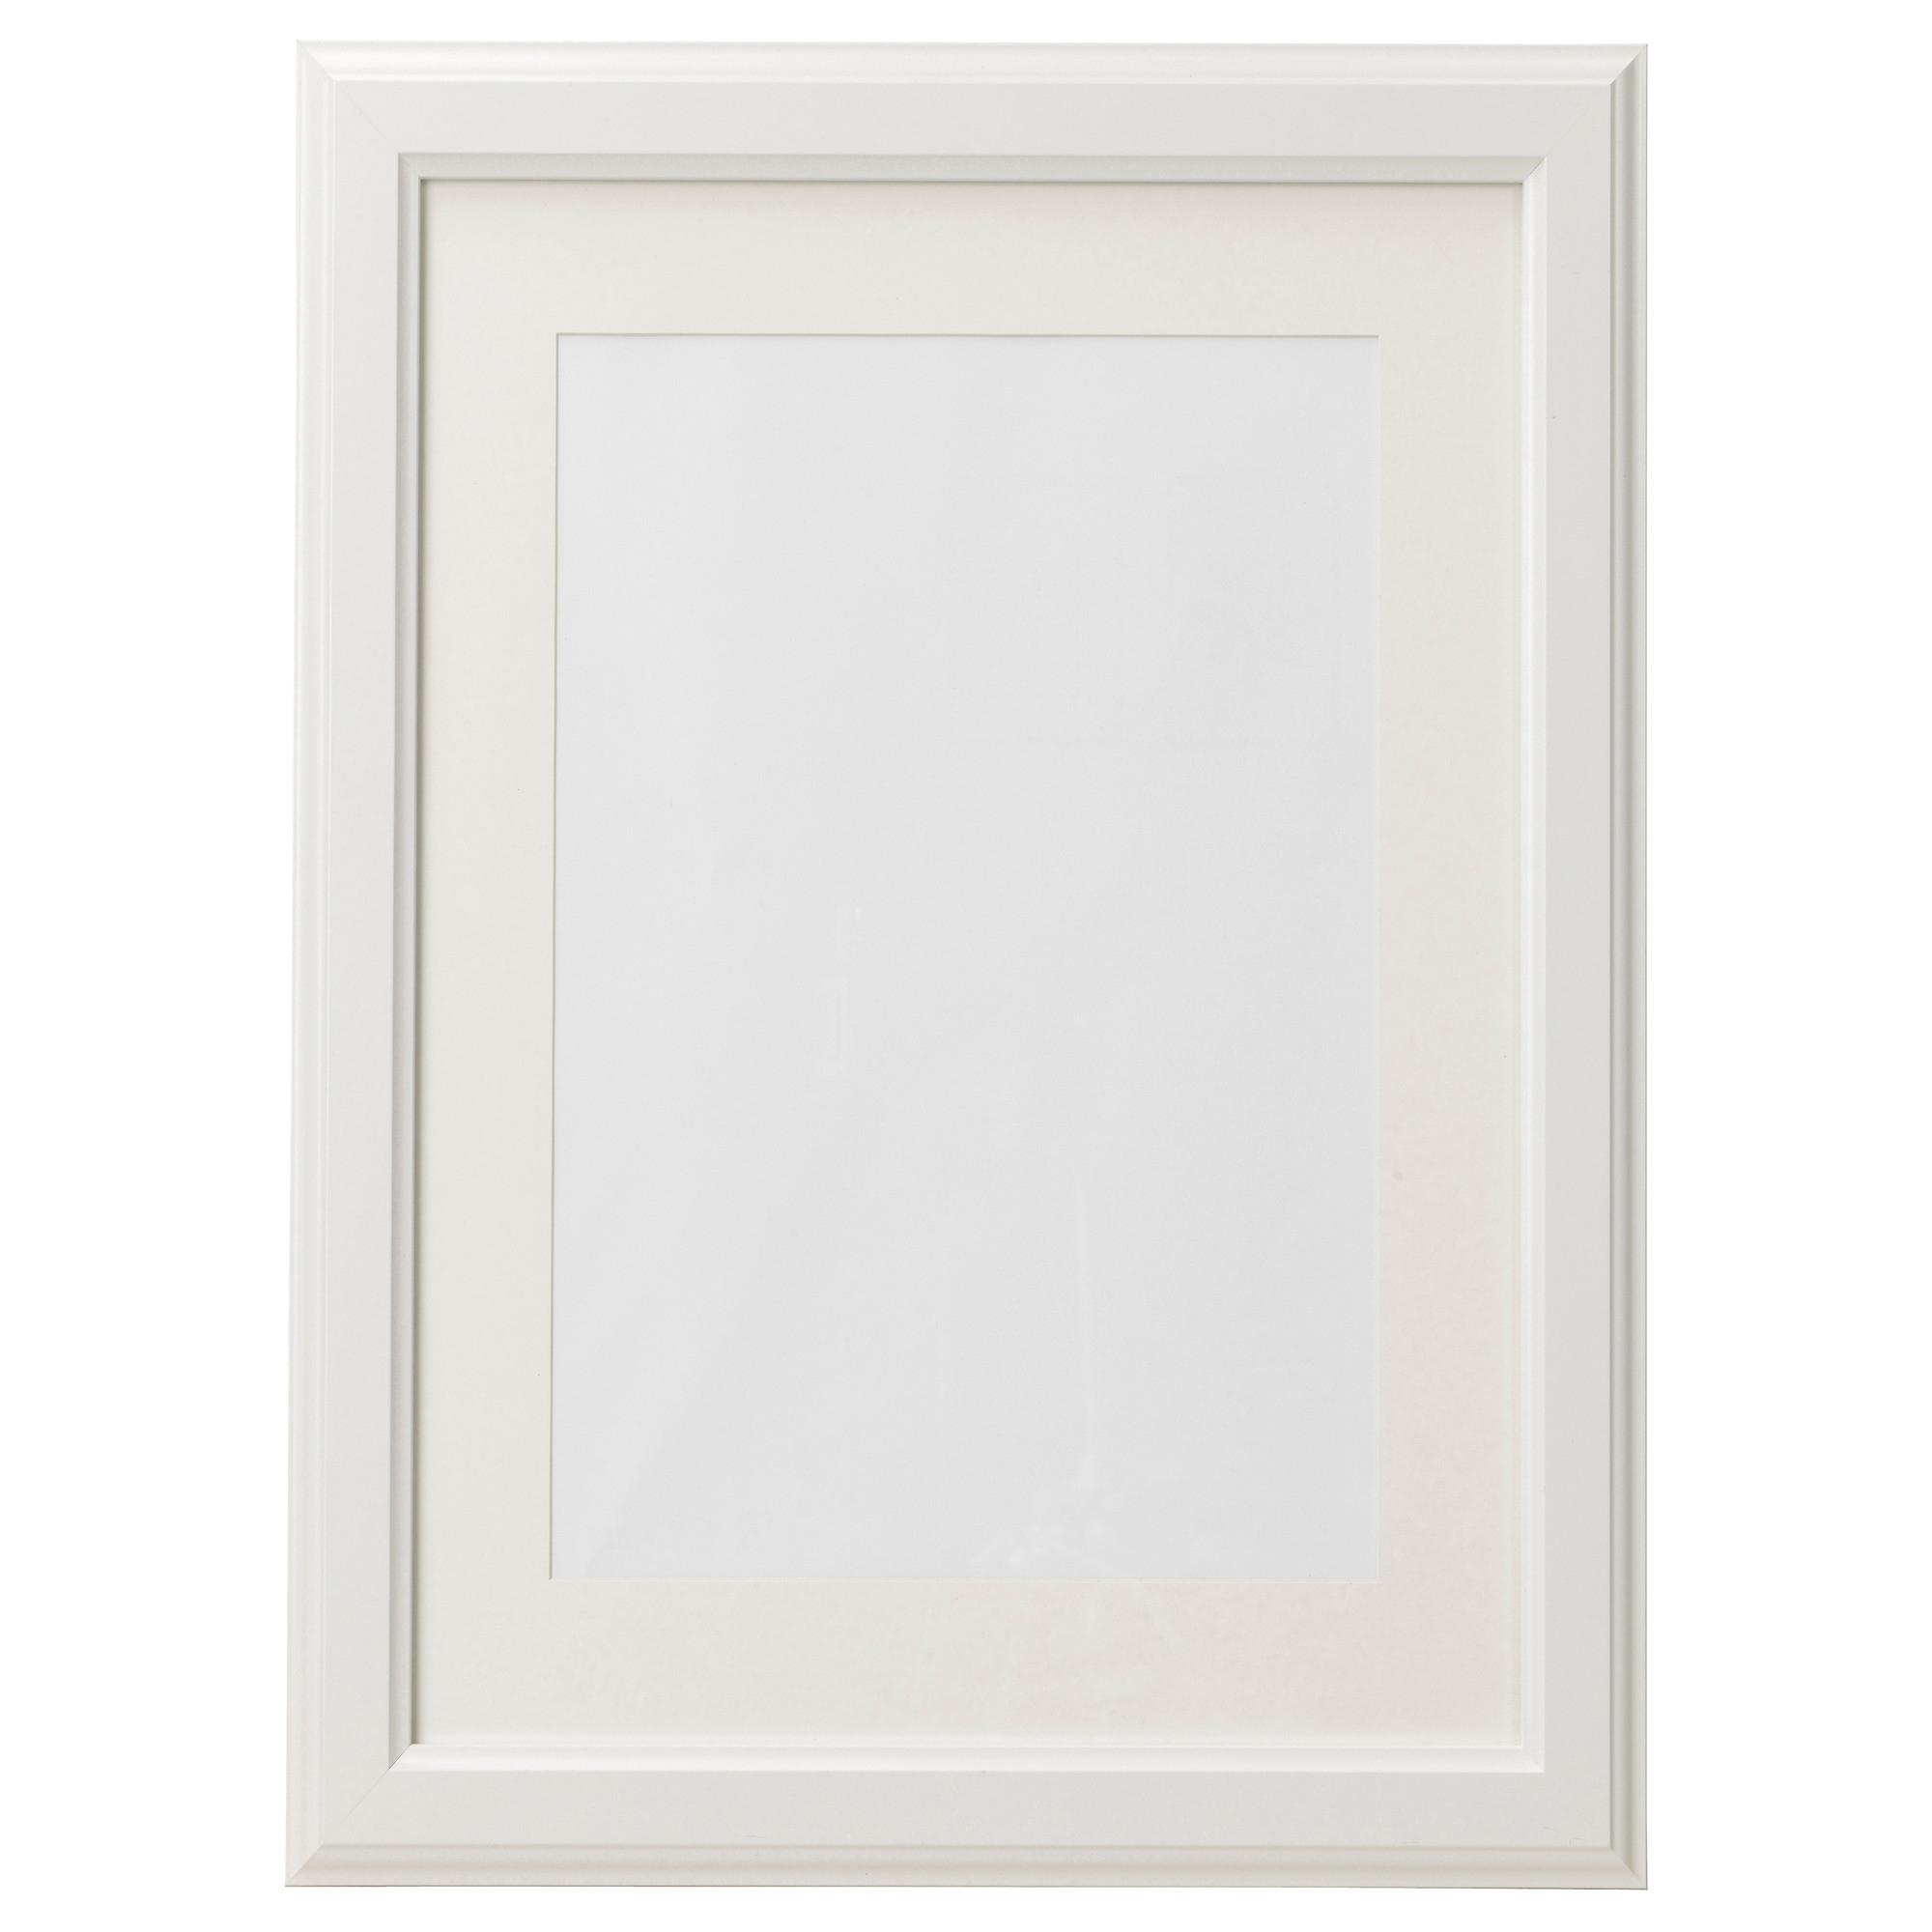 virserum marco 70x100 blanco. Black Bedroom Furniture Sets. Home Design Ideas